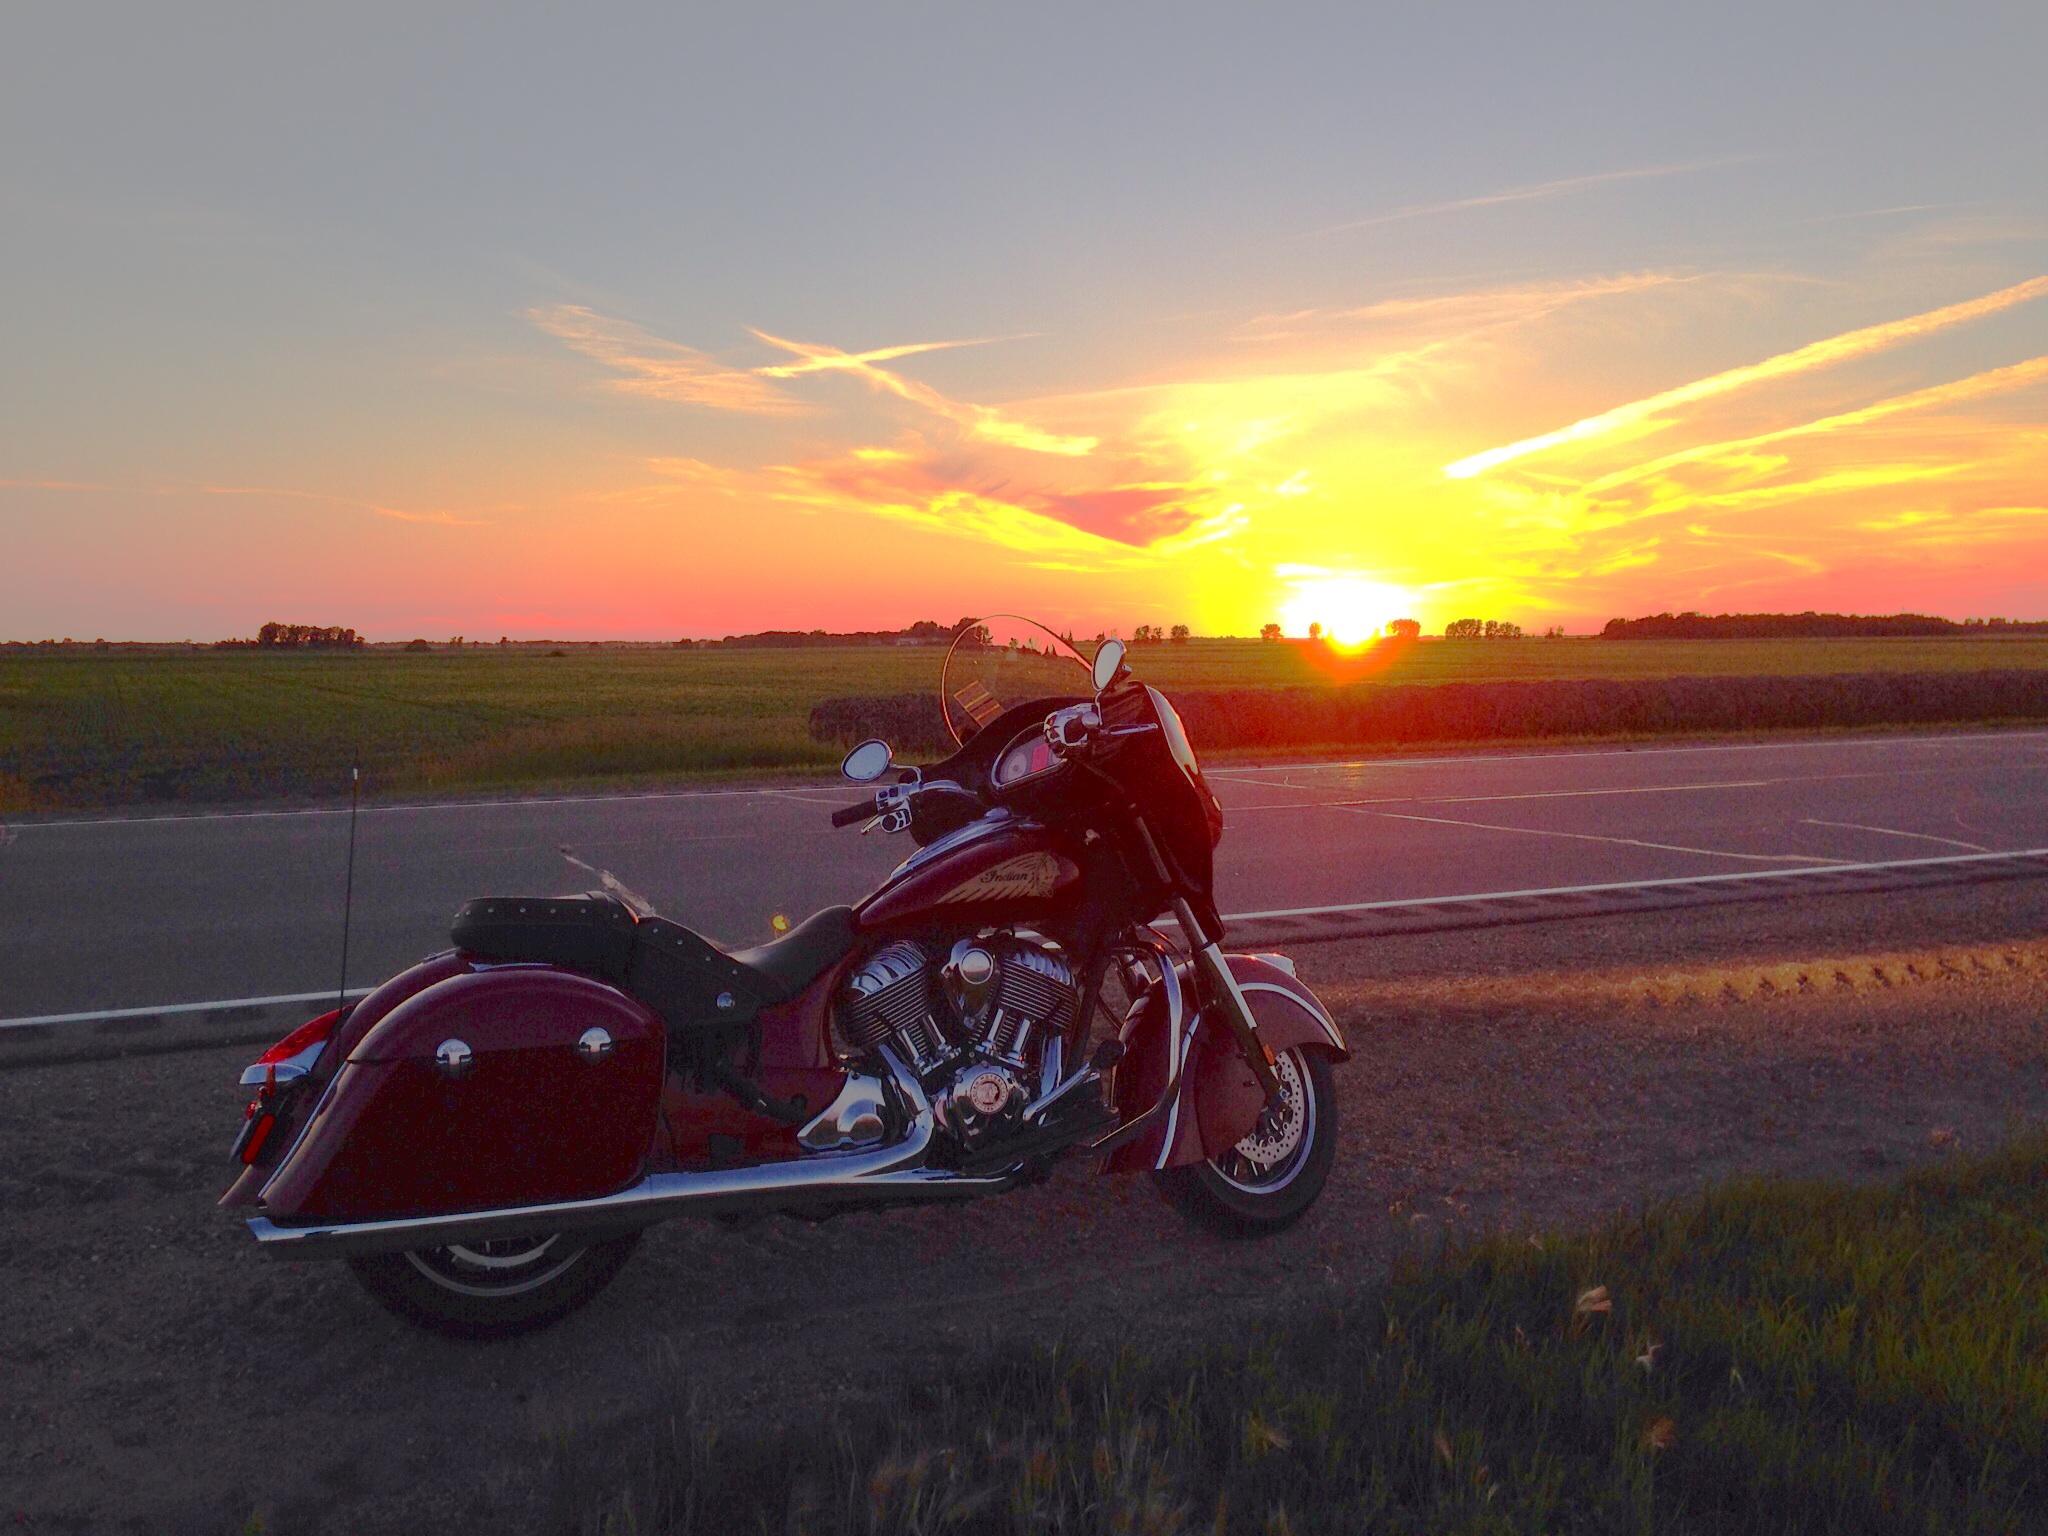 Kertsonville Township, MN, USA Sunrise Sunset Times